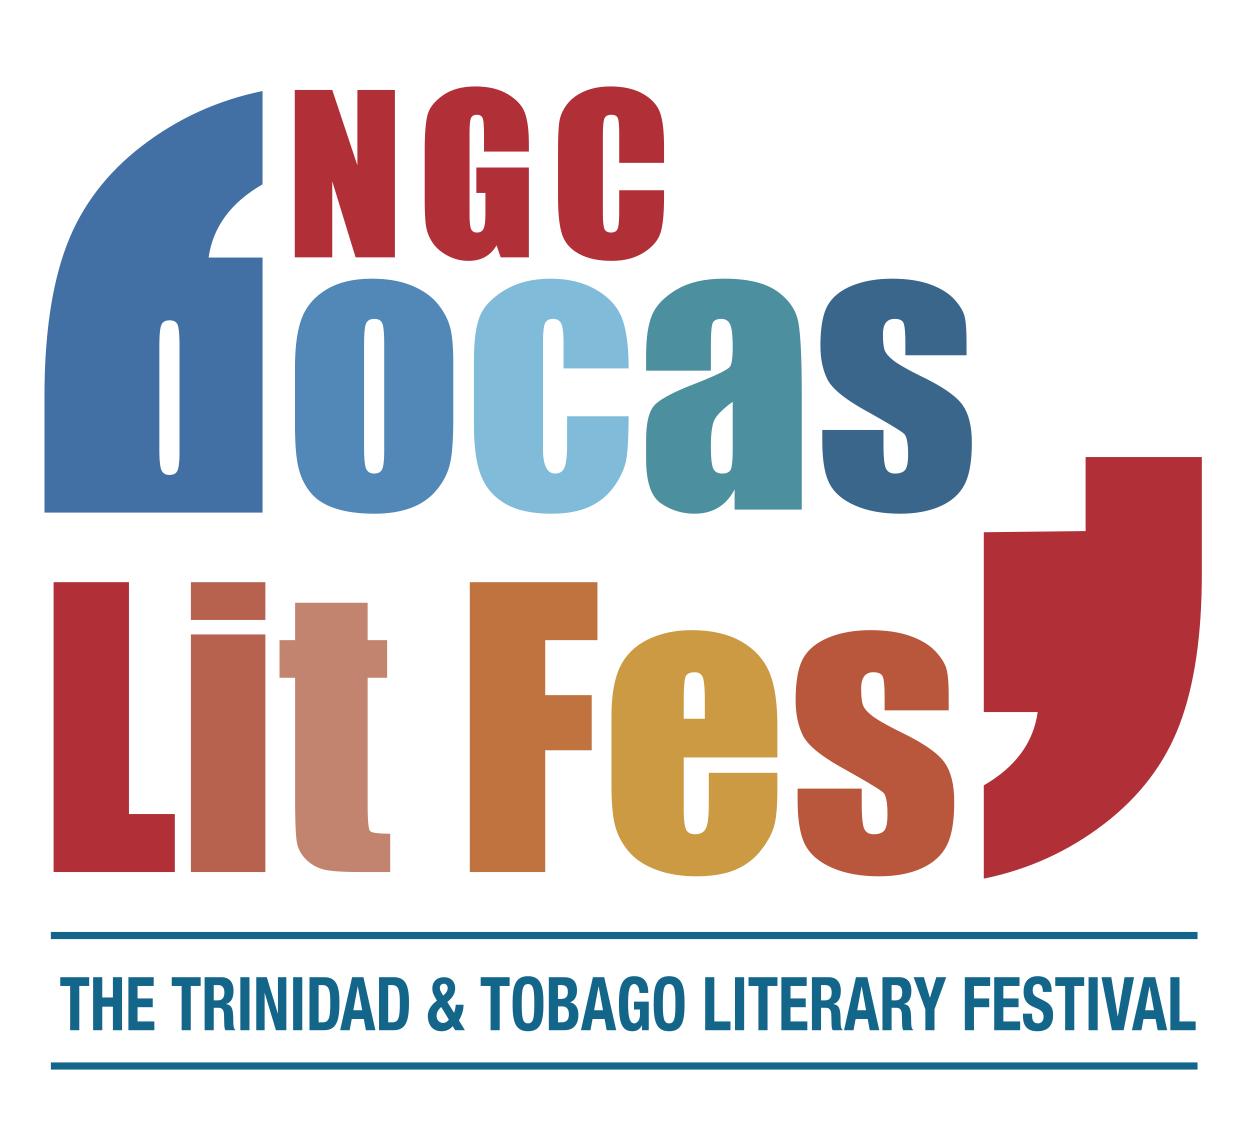 NGC bocas lit fest logo.png